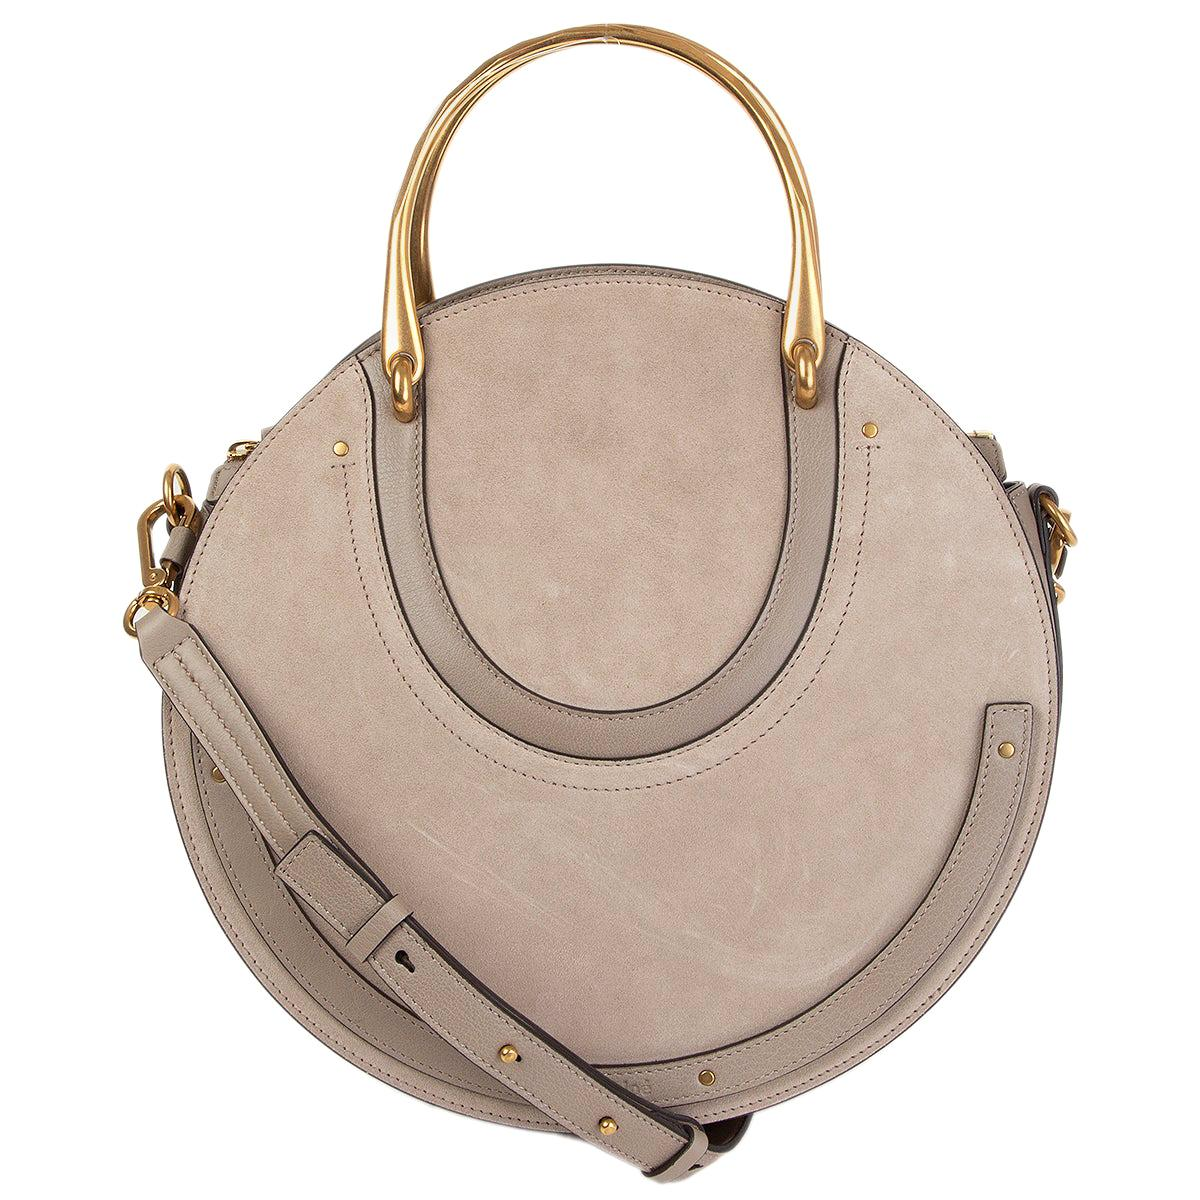 CHLOE Motty grey suede PIXIE MEDIUM DOUBLE HANDLE Bag